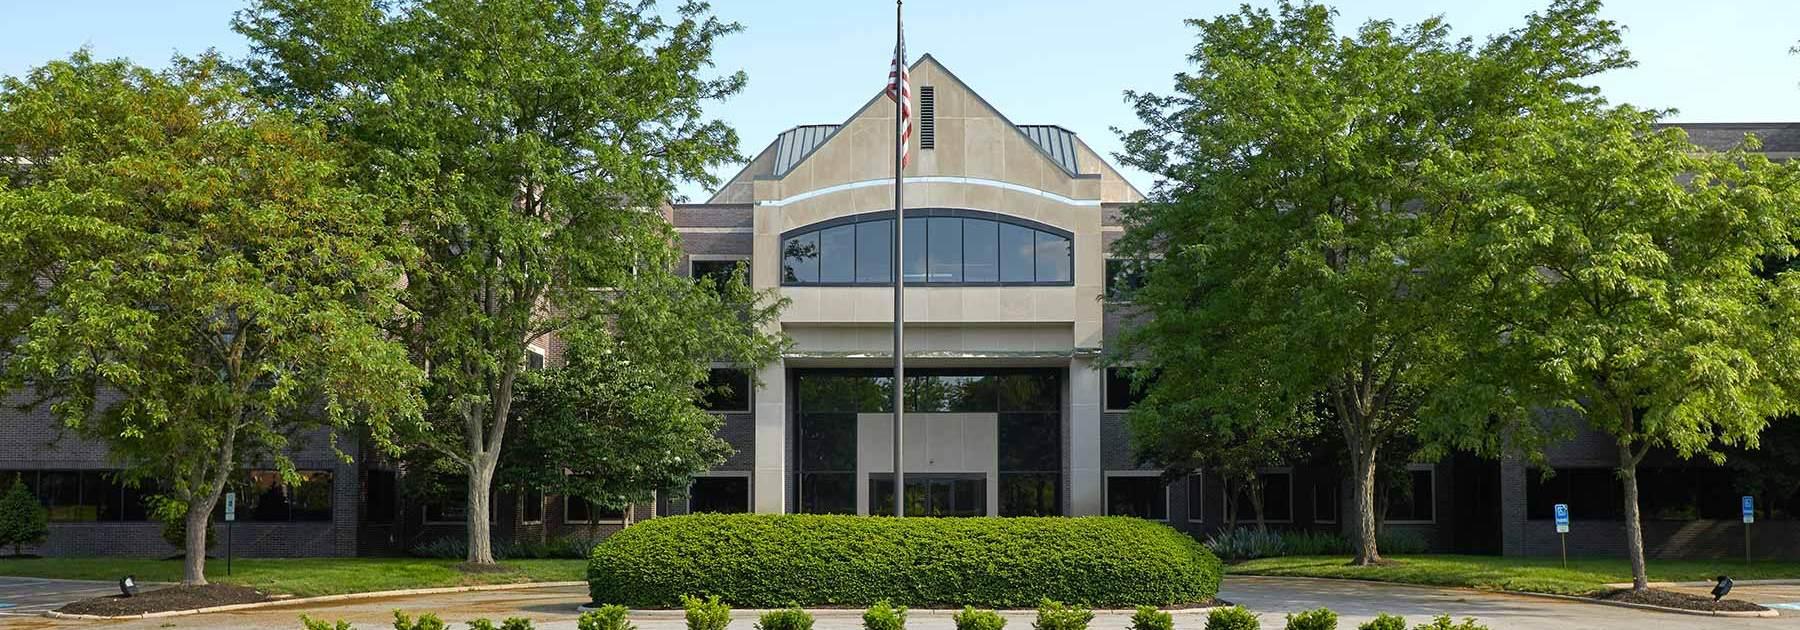 Bradenton Commercial Property